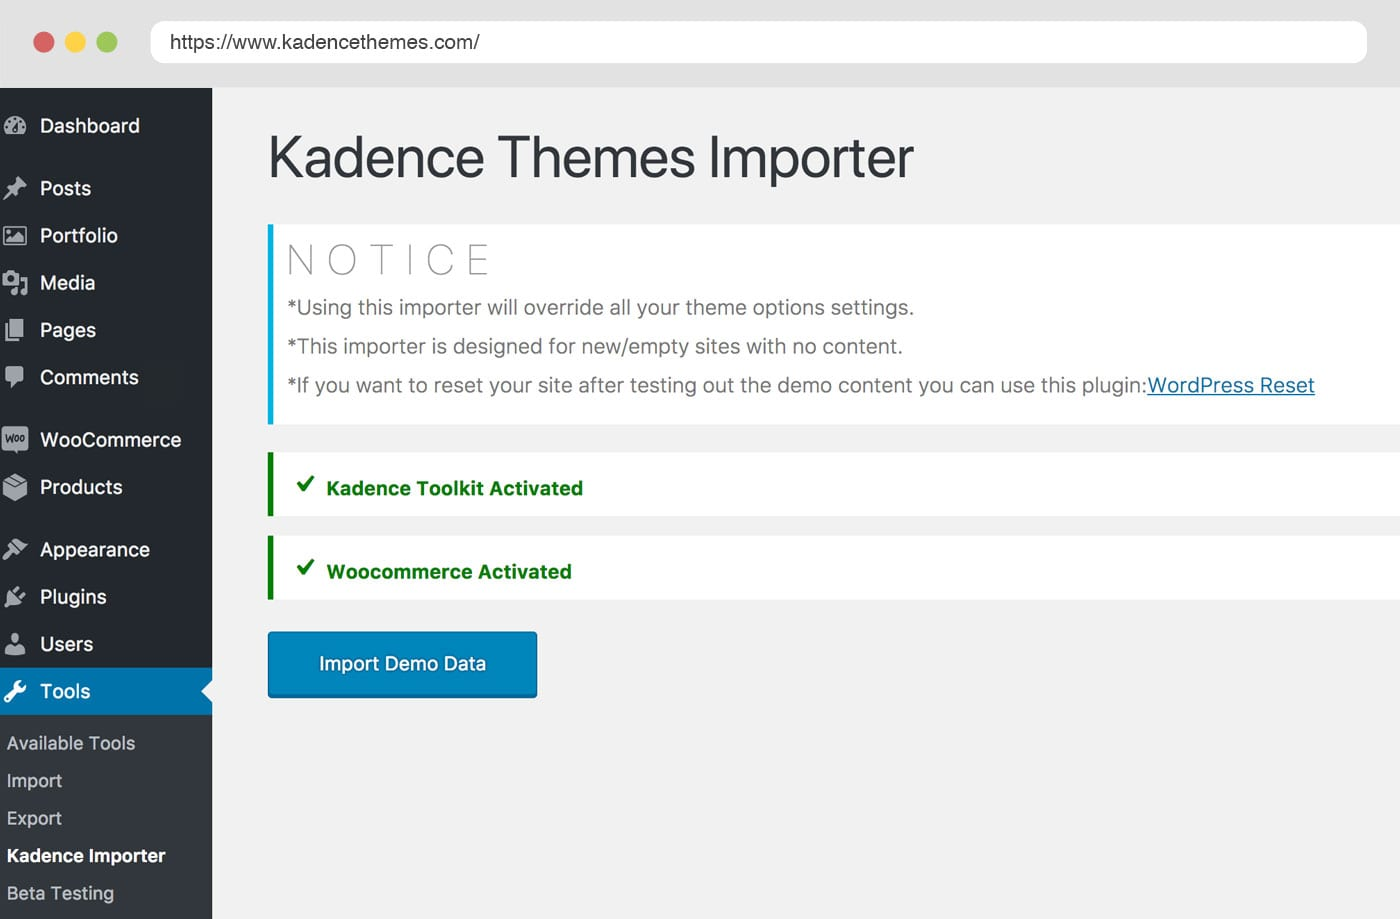 pinnacle free wordpress theme by kadence themes